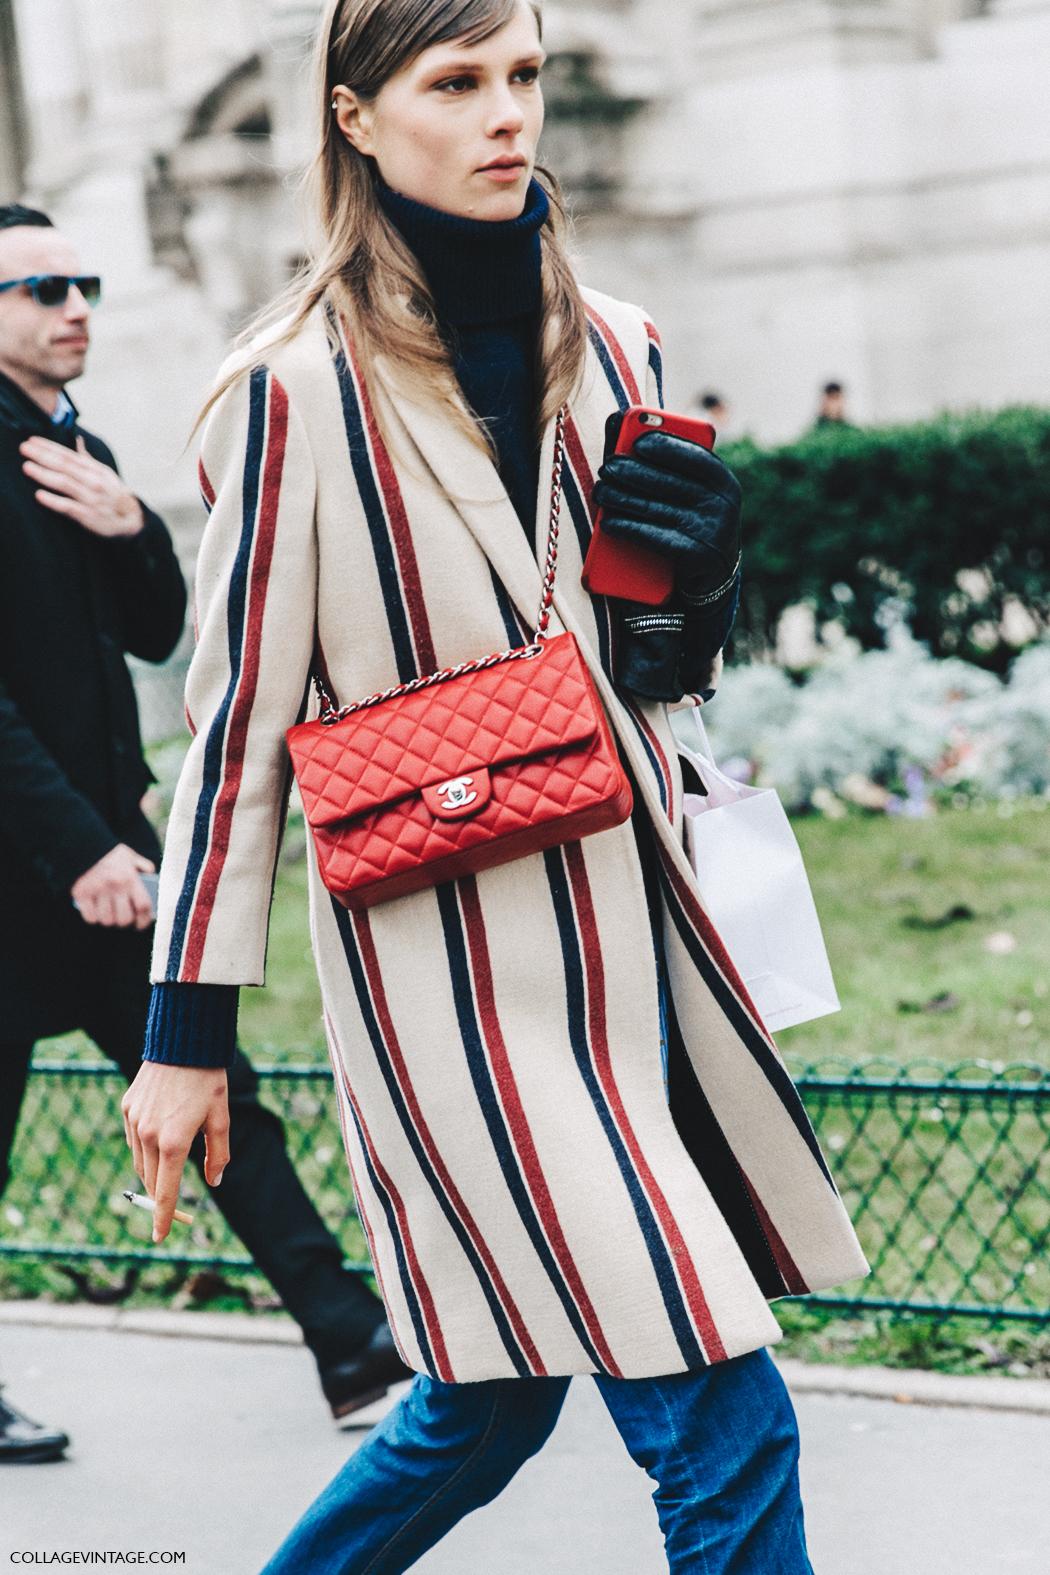 PFW-Paris_Fashion_Week_Fall_2016-Street_Style-Collage_Vintage-Caroline_Brasch-Striped_Coat-Chanel_Bag-4